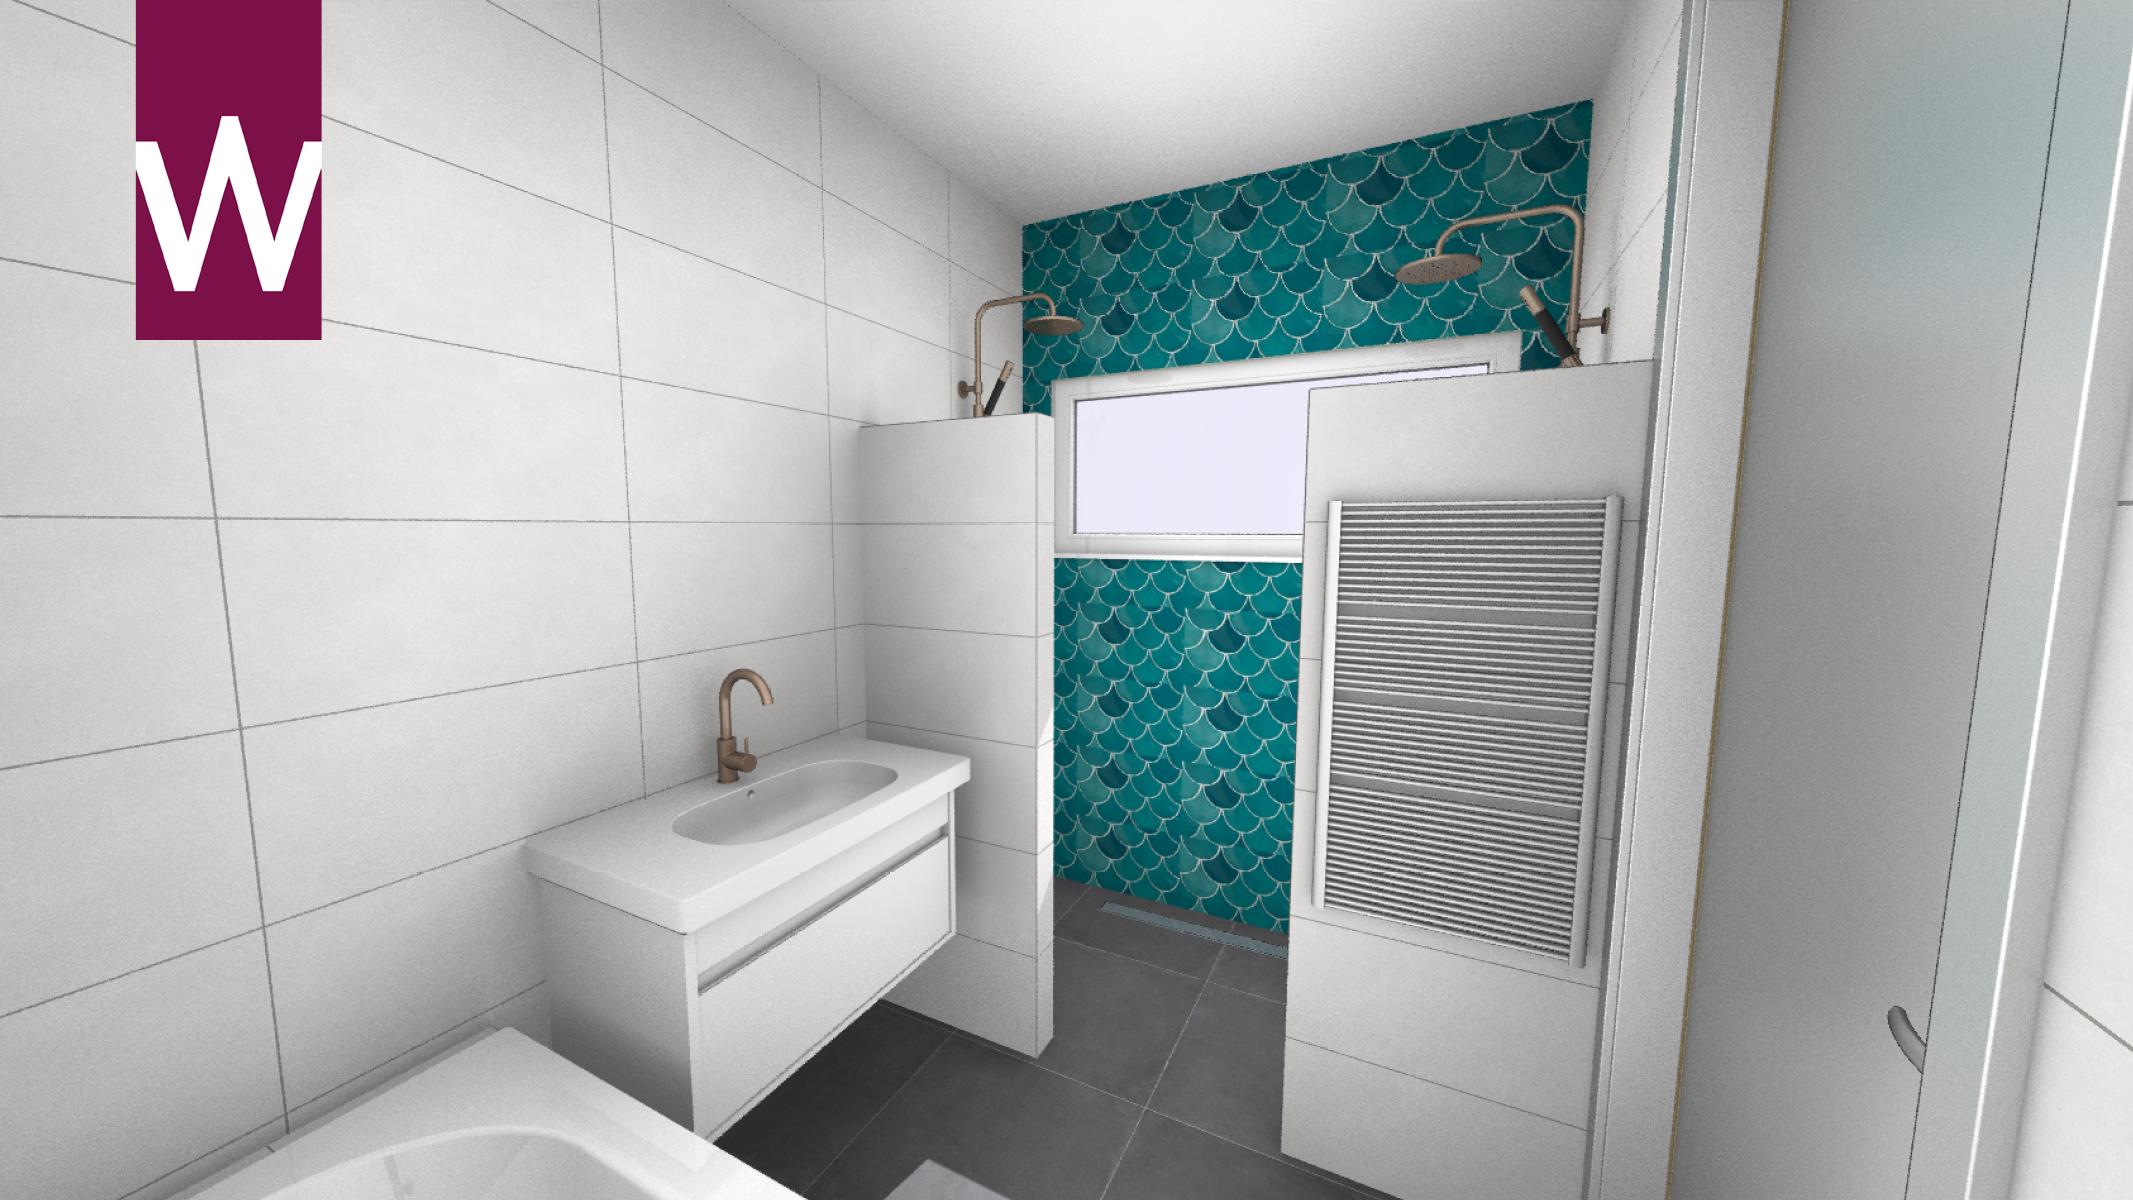 Simpel Pure Badkamer : Complete badkamer met bad twee douches en opvallende muur d